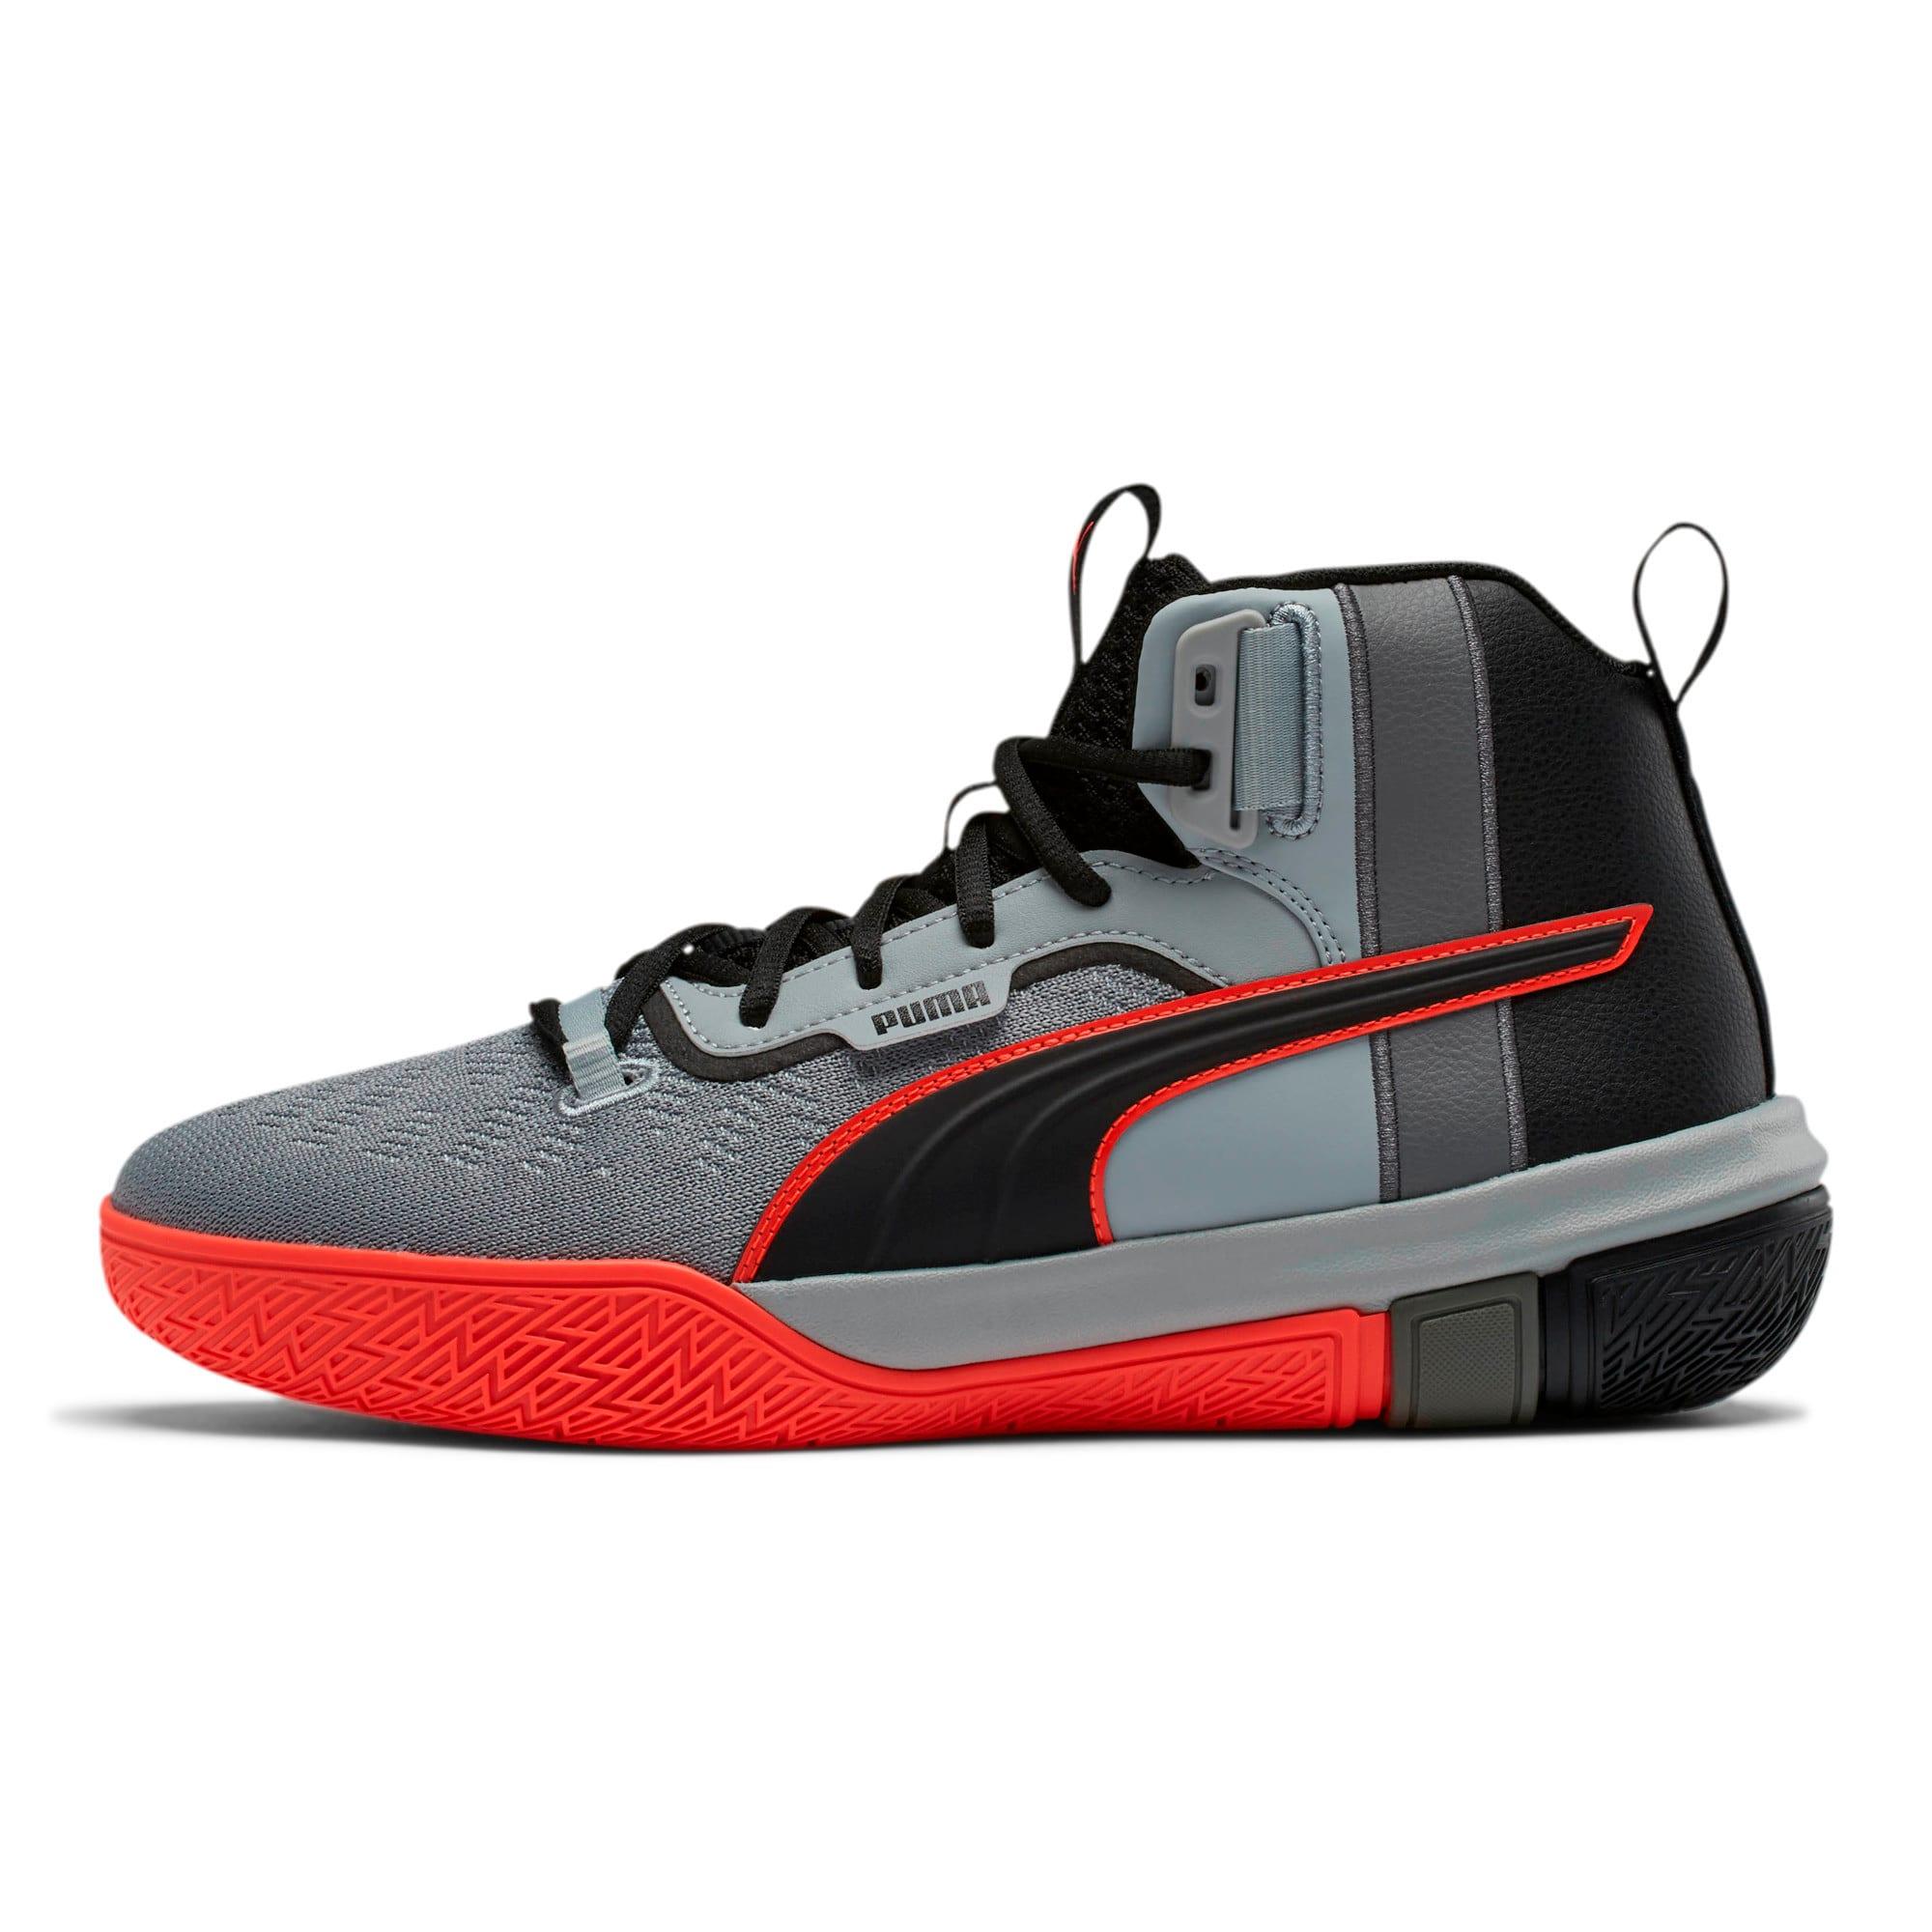 Thumbnail 1 of Legacy Disrupt Basketball Shoes, Puma Black-Red Blast, medium